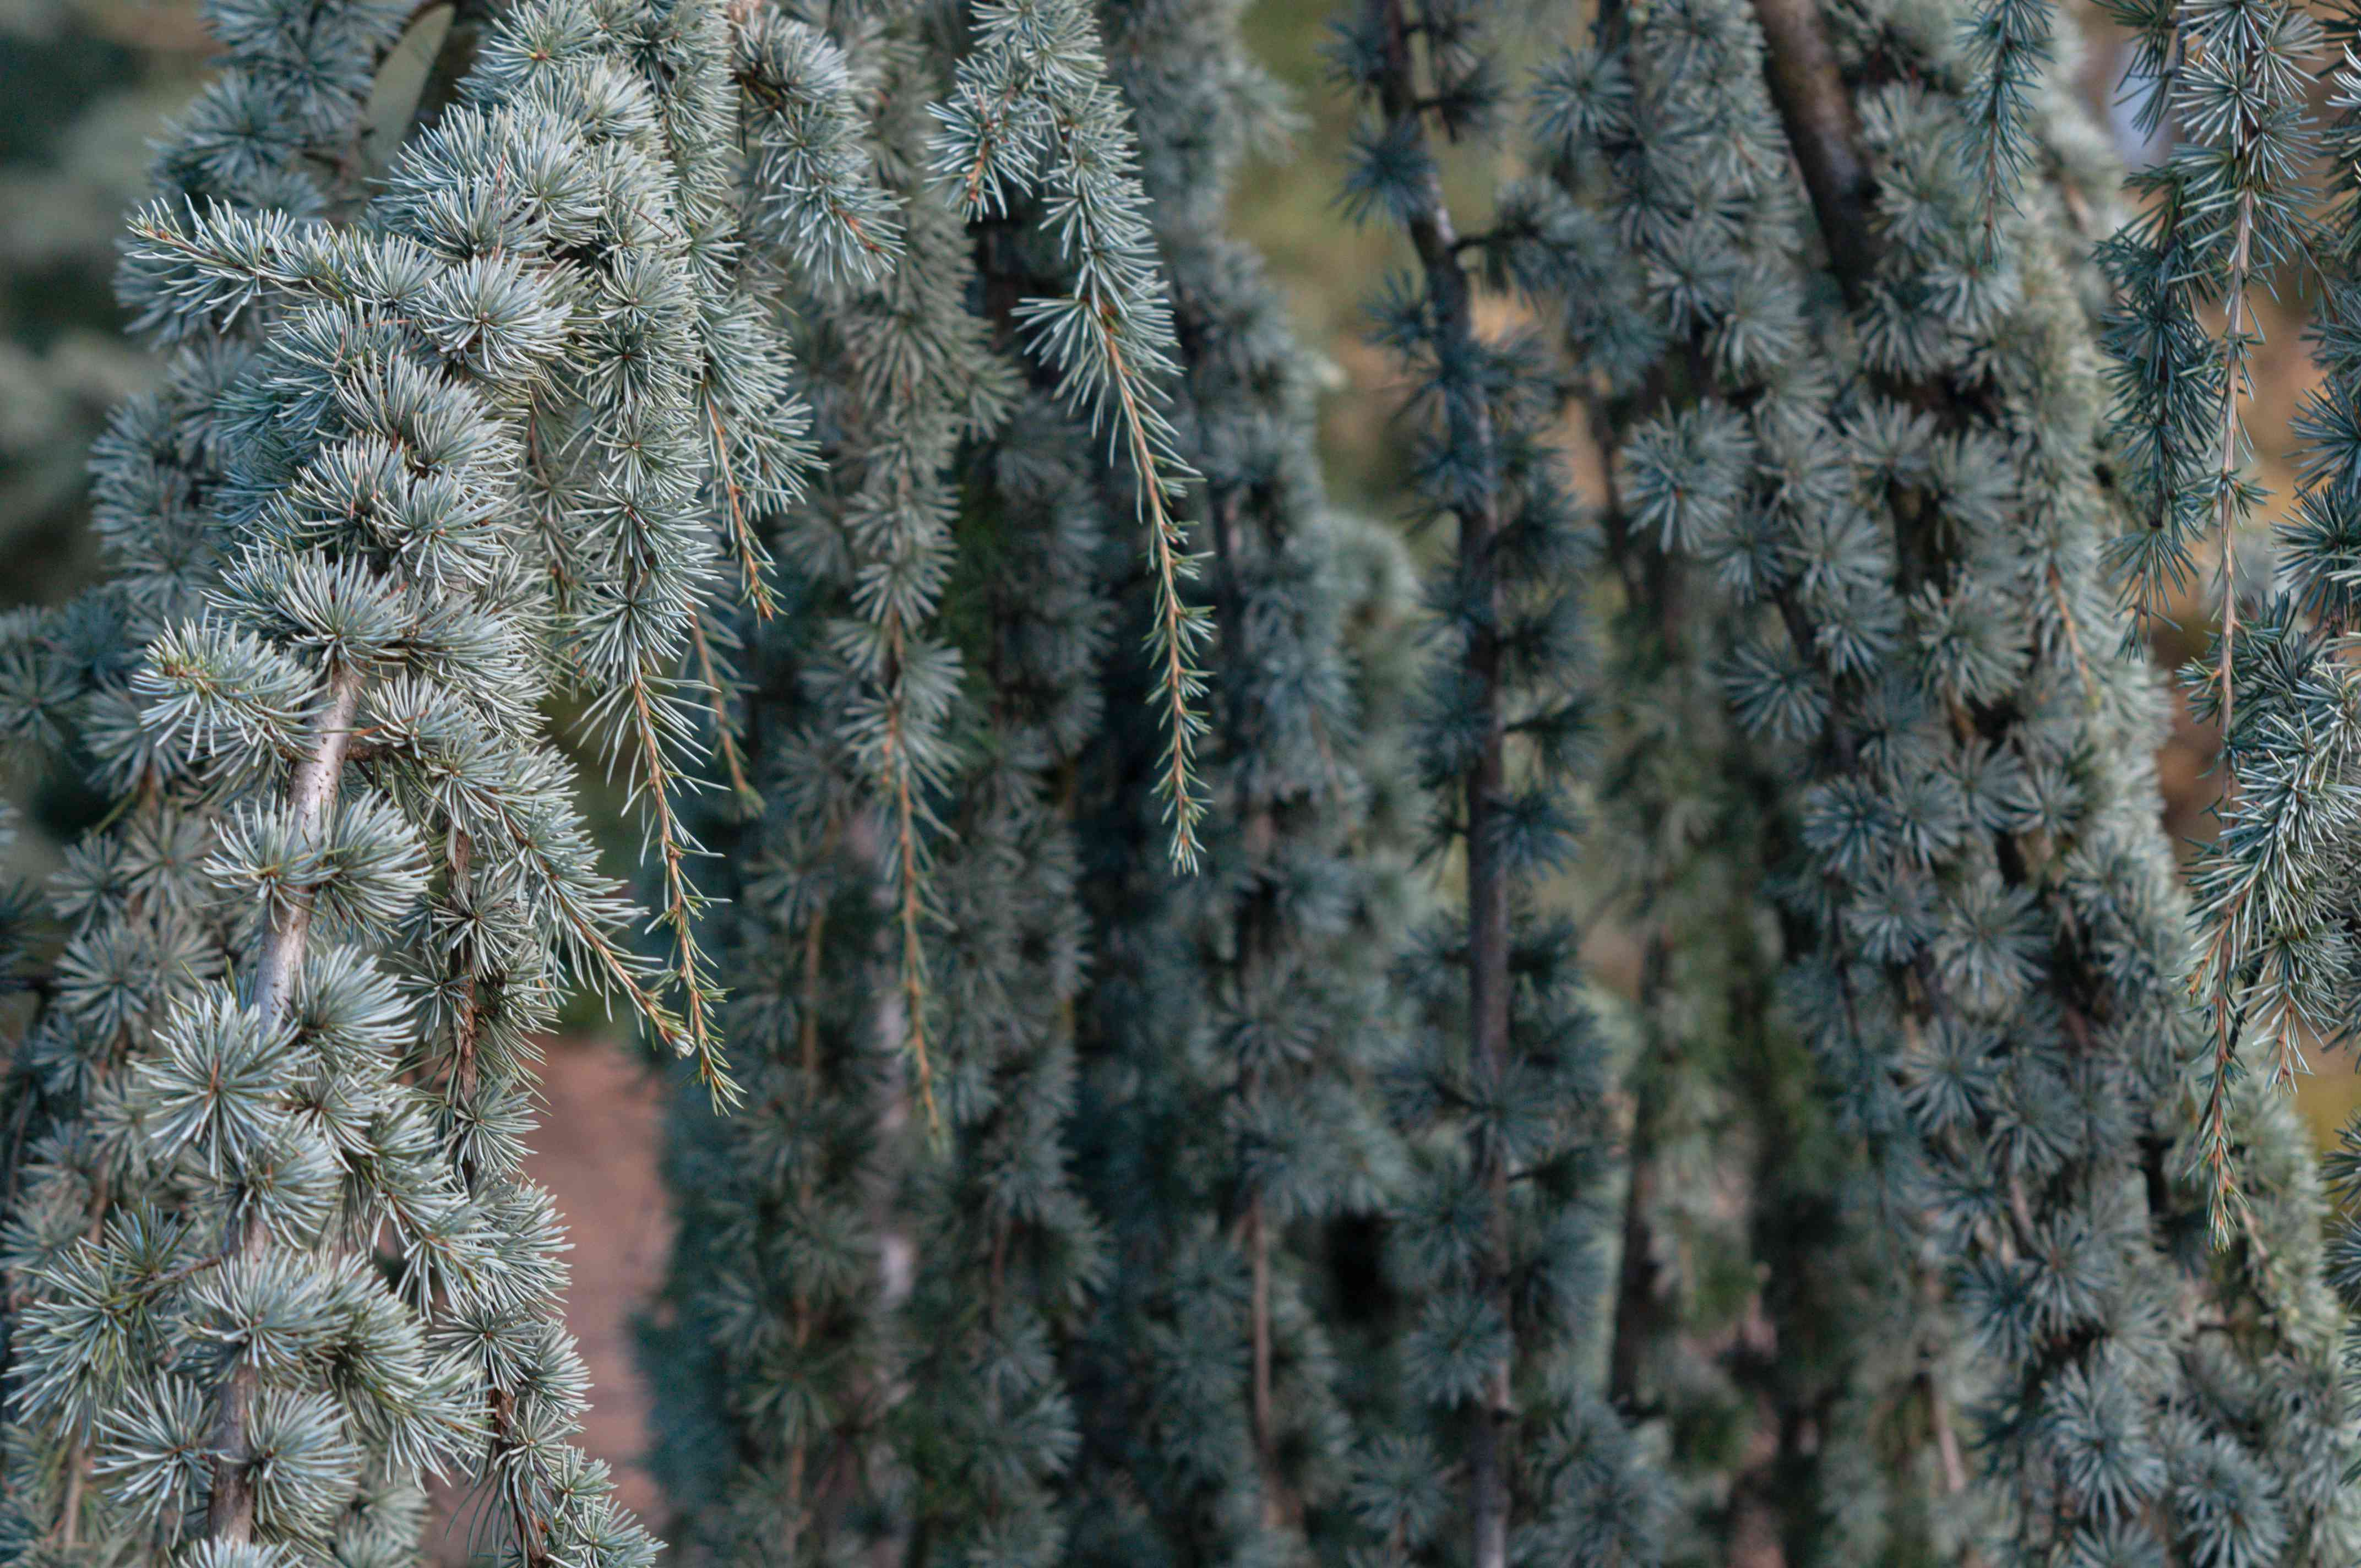 Blue atlas cedar branches of whorls with evergreen needles closeup